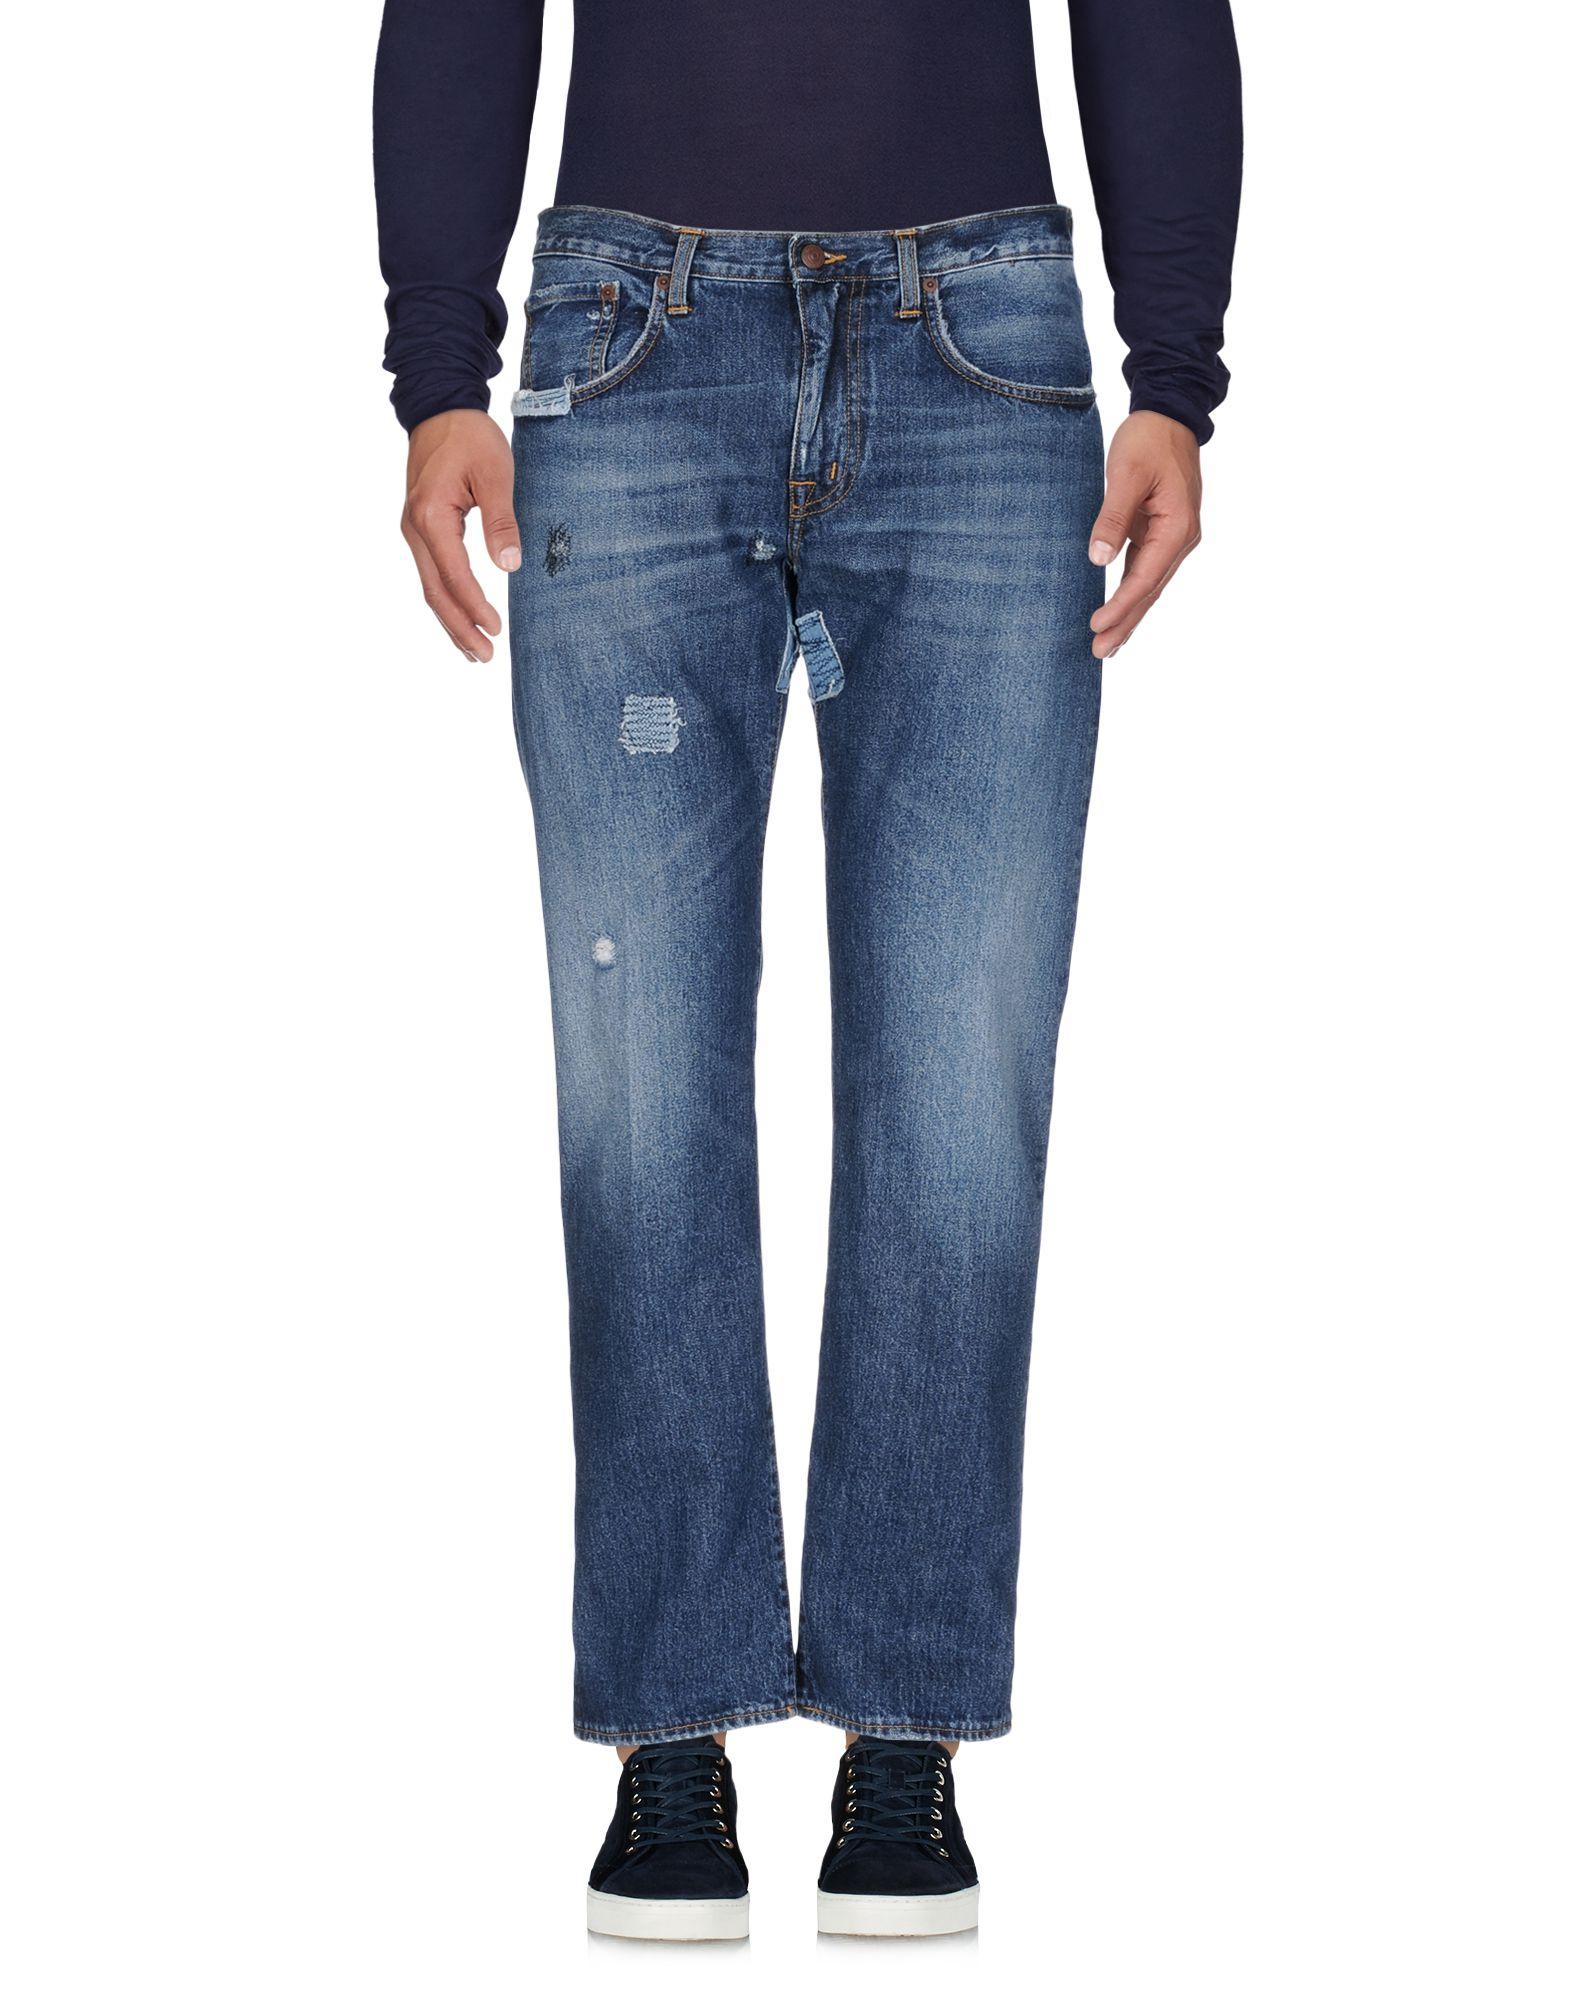 Pantaloni Jeans (+) People uomo - 42616929PT 42616929PT  Outlet-Store